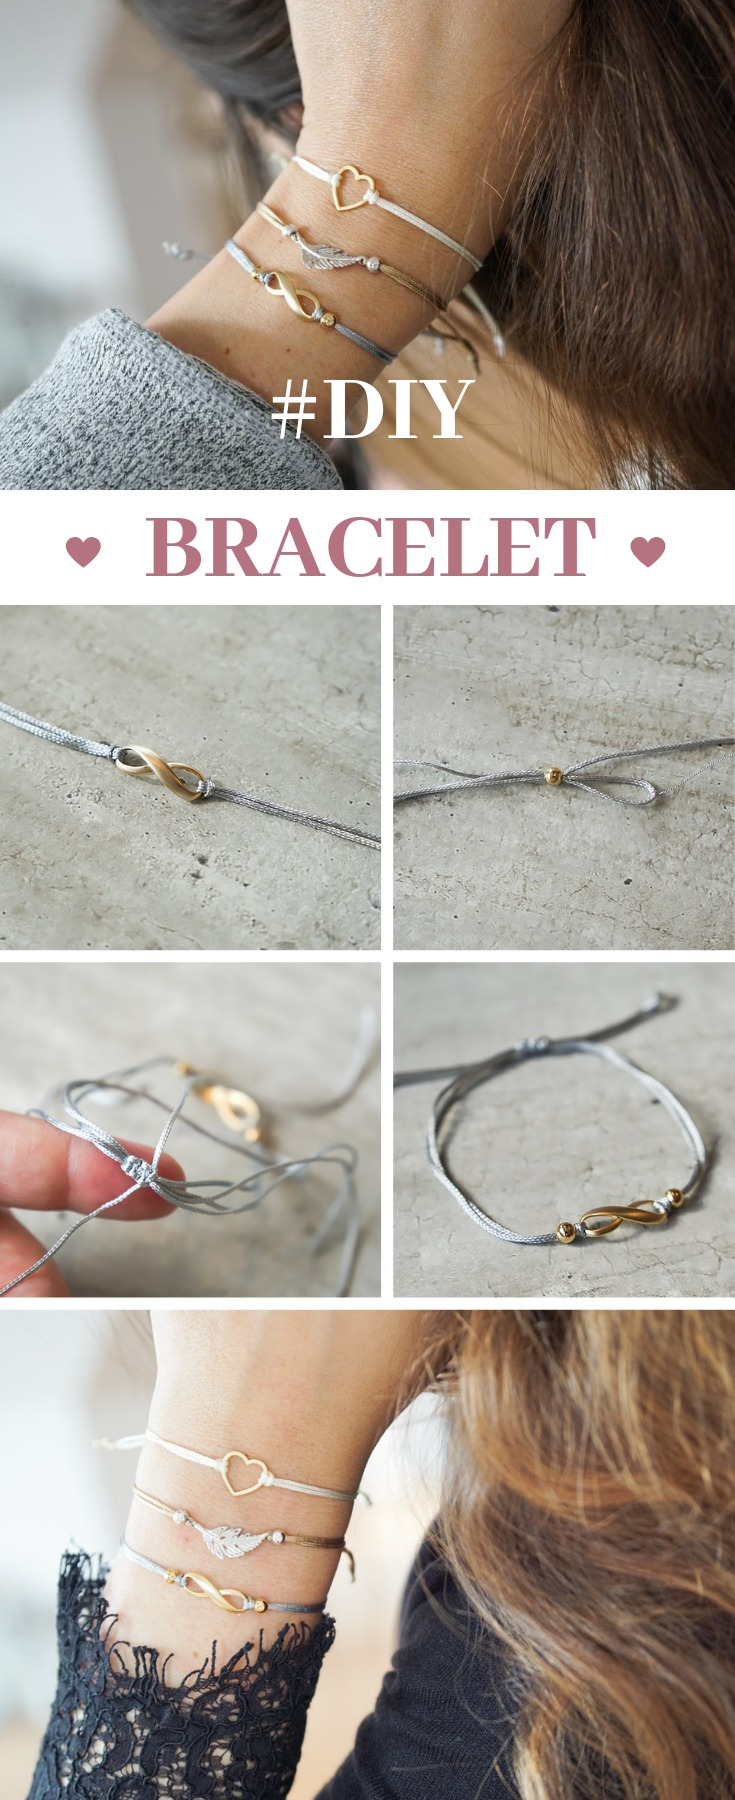 Simple DIY bracelets with slide closure